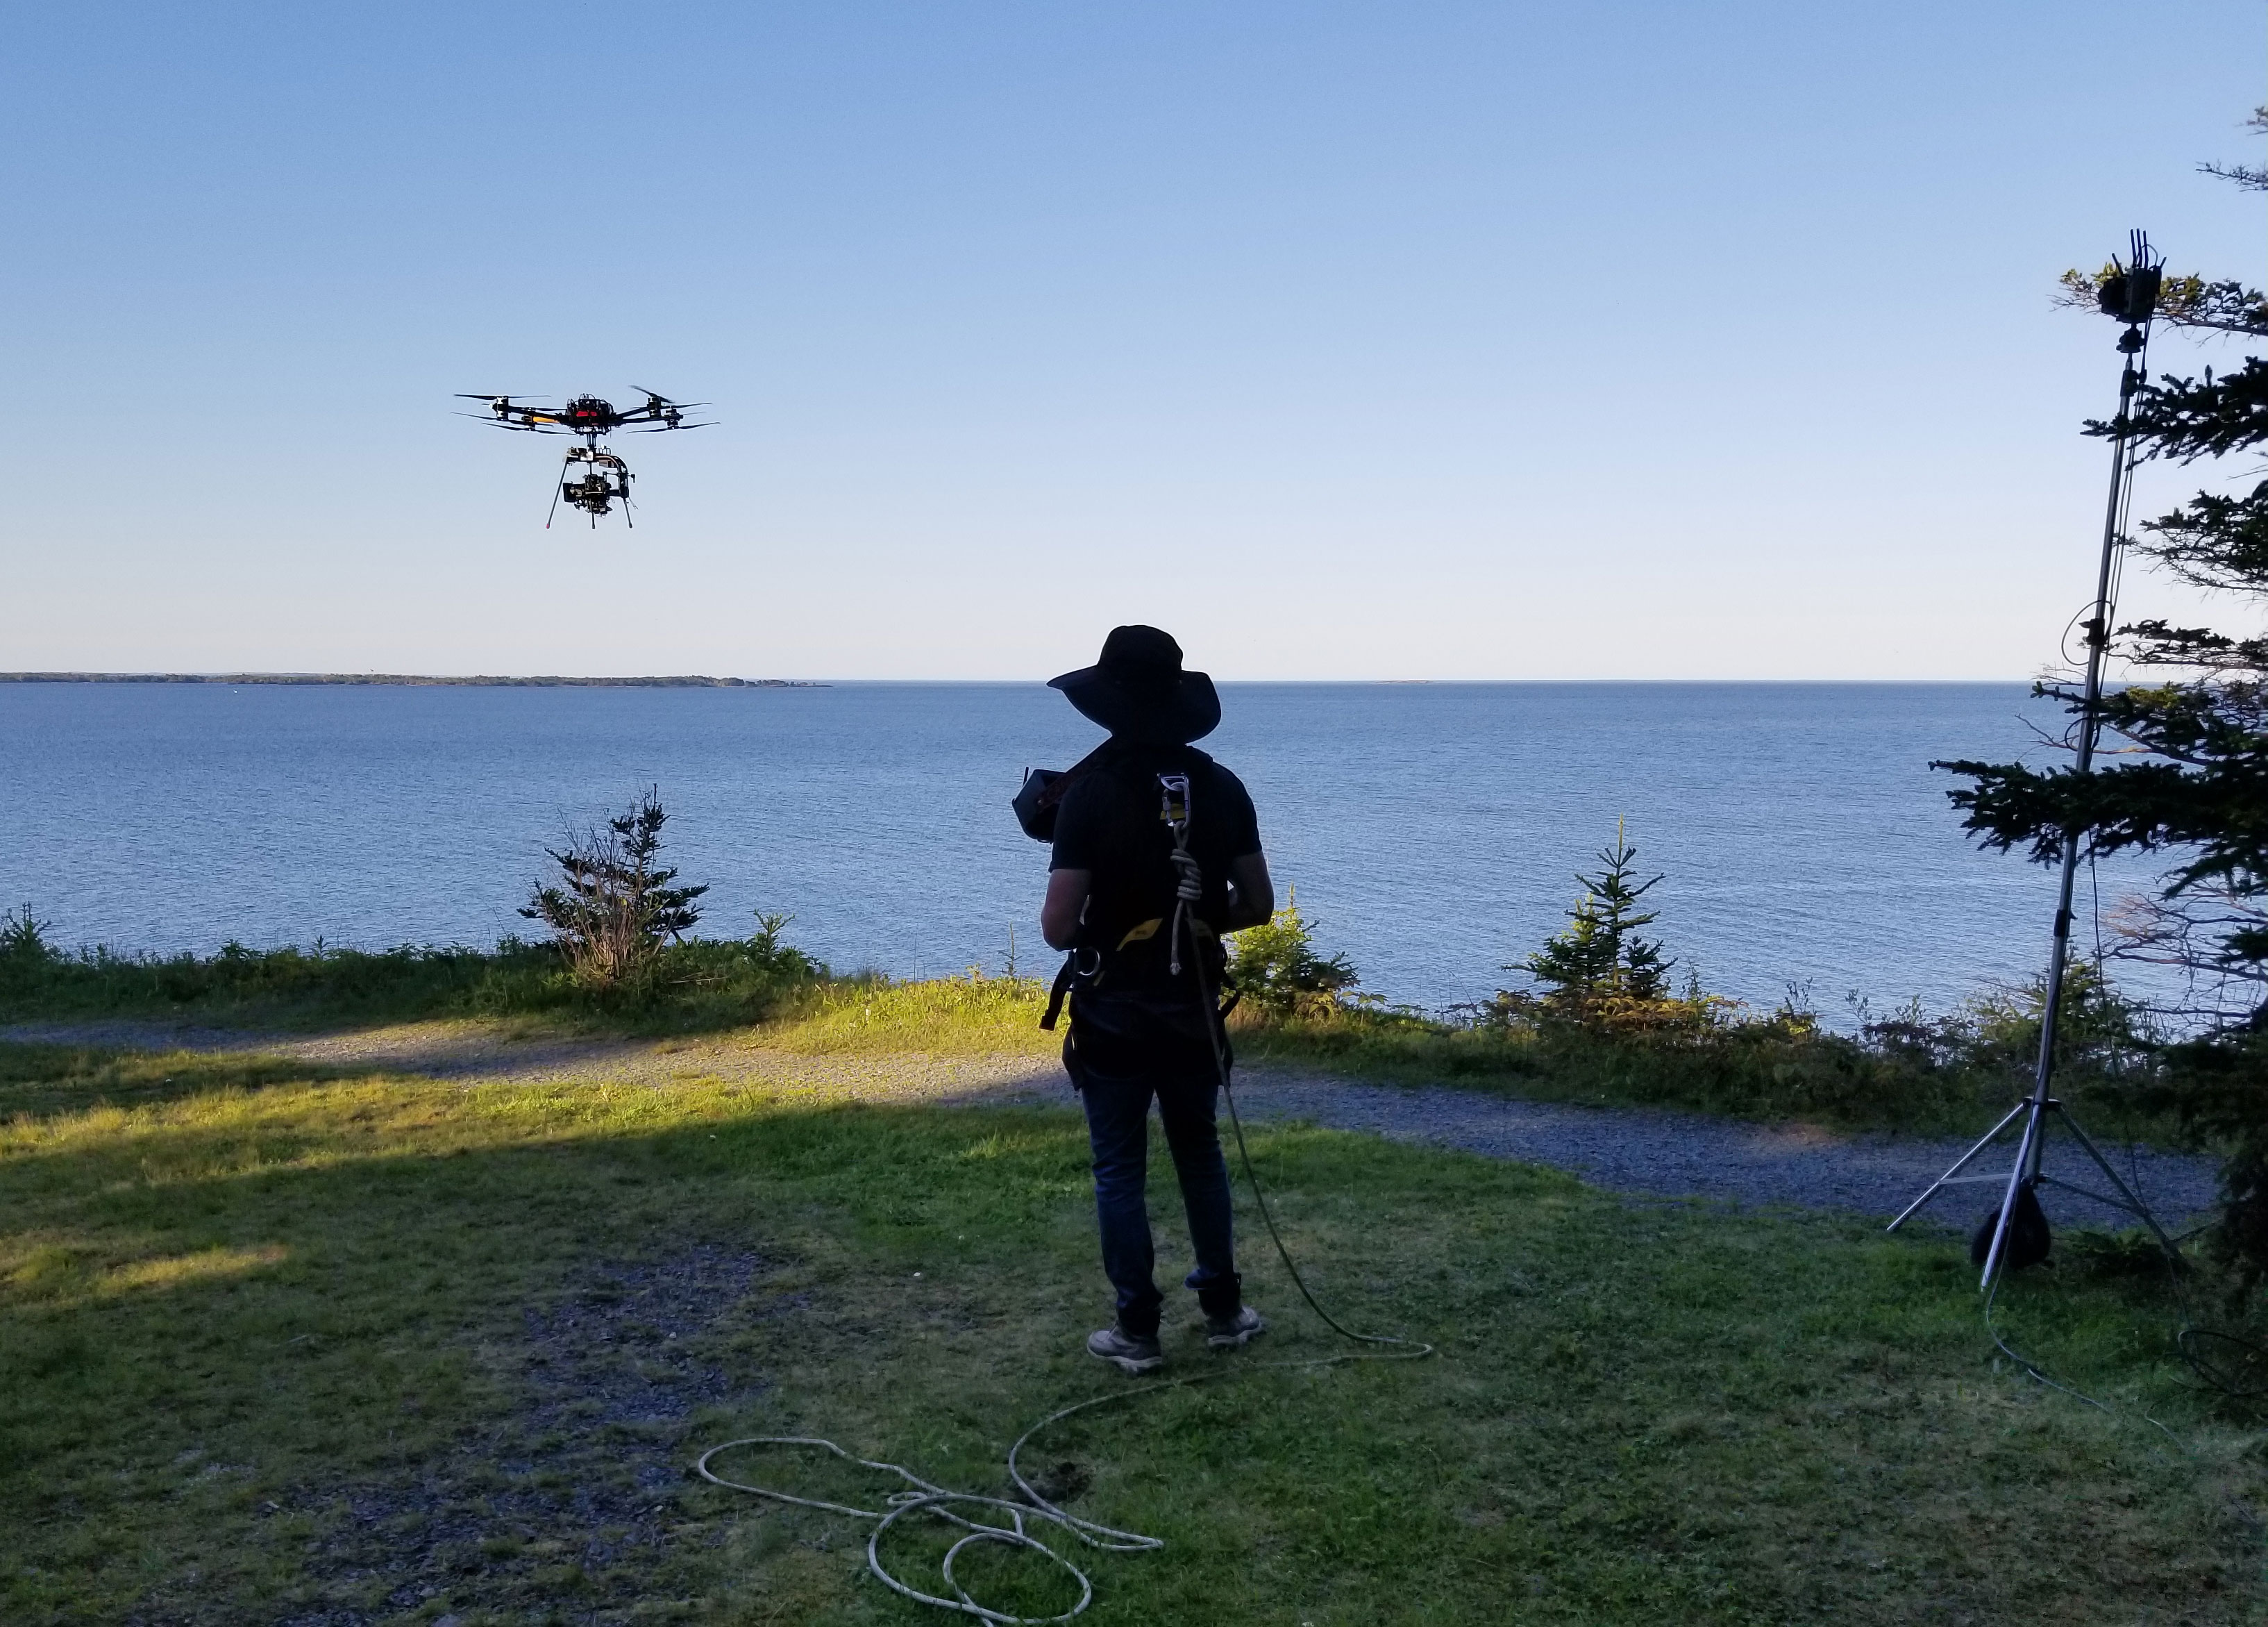 SpyderX Nova Scotia